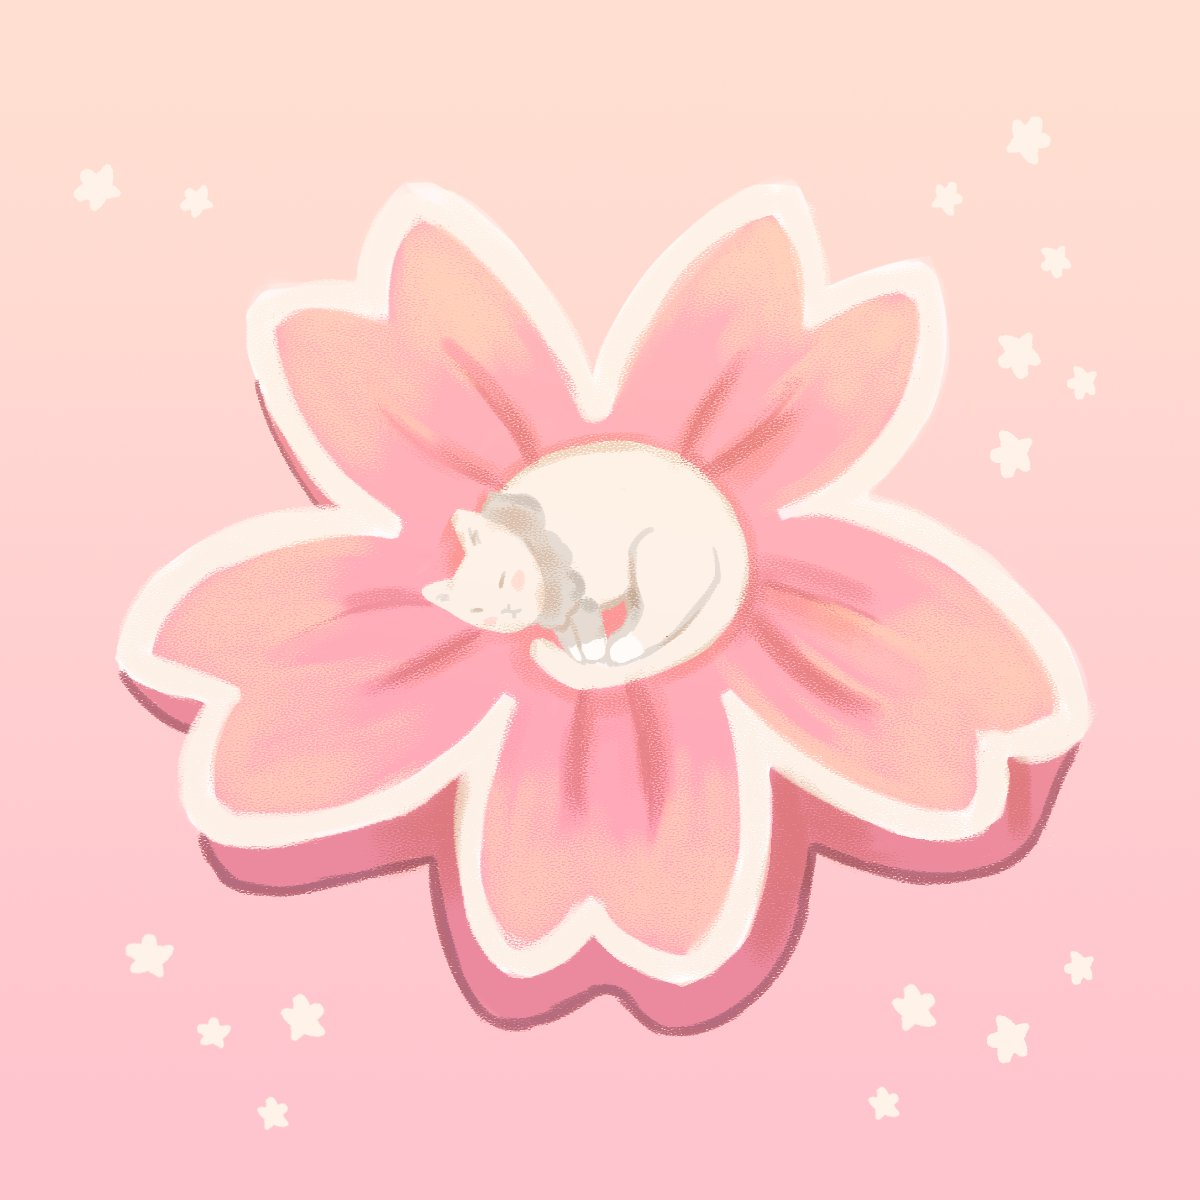 Cherry Blossom Cat 🌸 #01  #art #animal #illustration #digitalart #food #desserts #cat #design #digiart #digitalillustration #artwork #anime #cute #kawaiiart #impressionism #pastel #pastelart #keychain #stationary